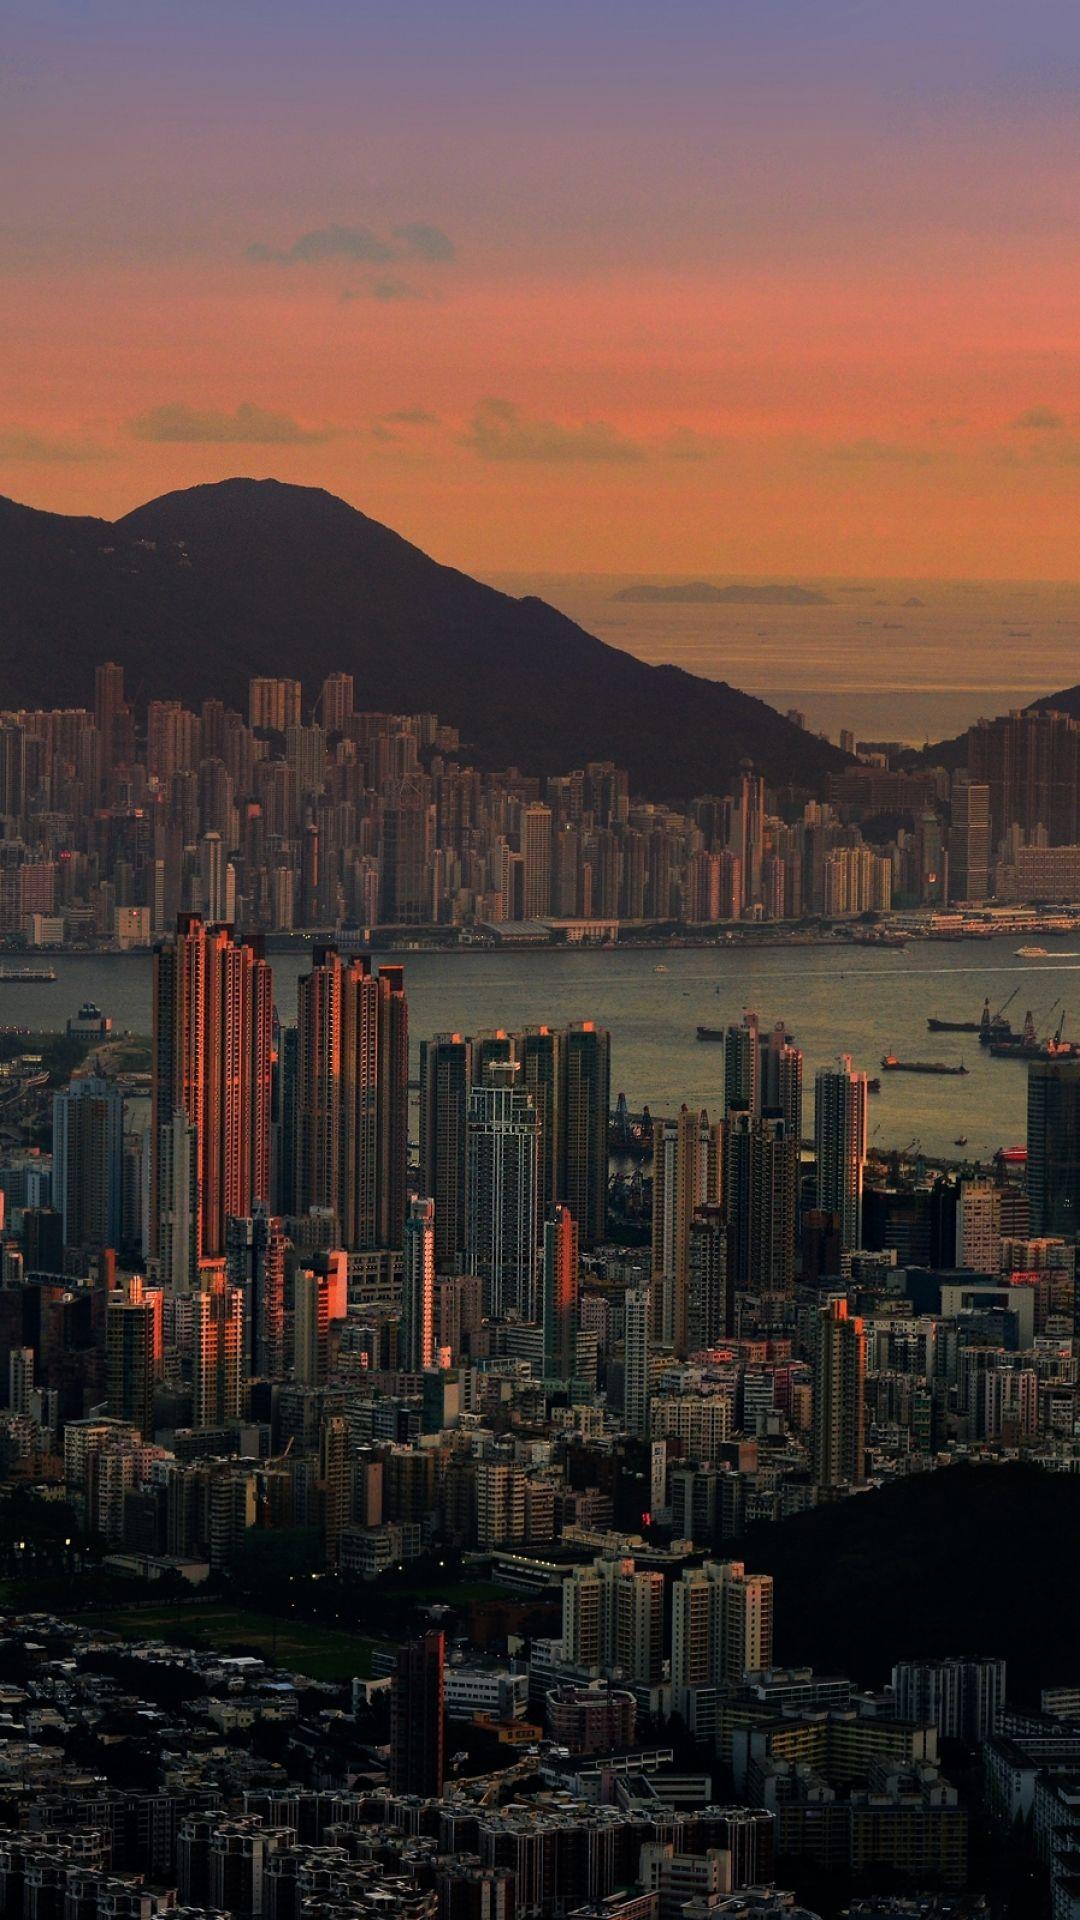 Hong Kong City Sunset 4K Wallpapers - Wallpaper Cave